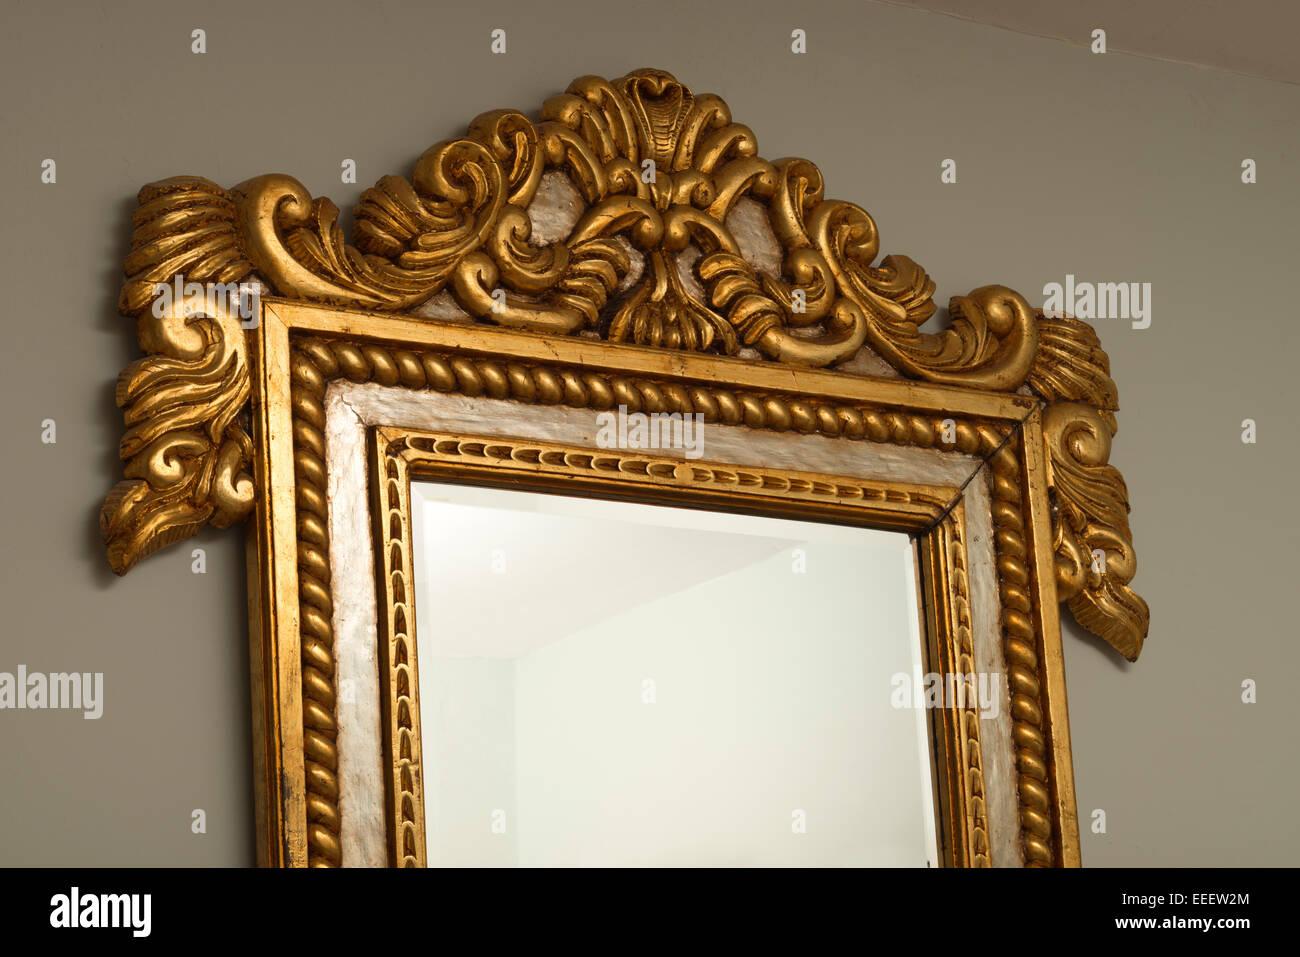 Gilded Mahogany Wall Mirror Frame From Honduras. Silver